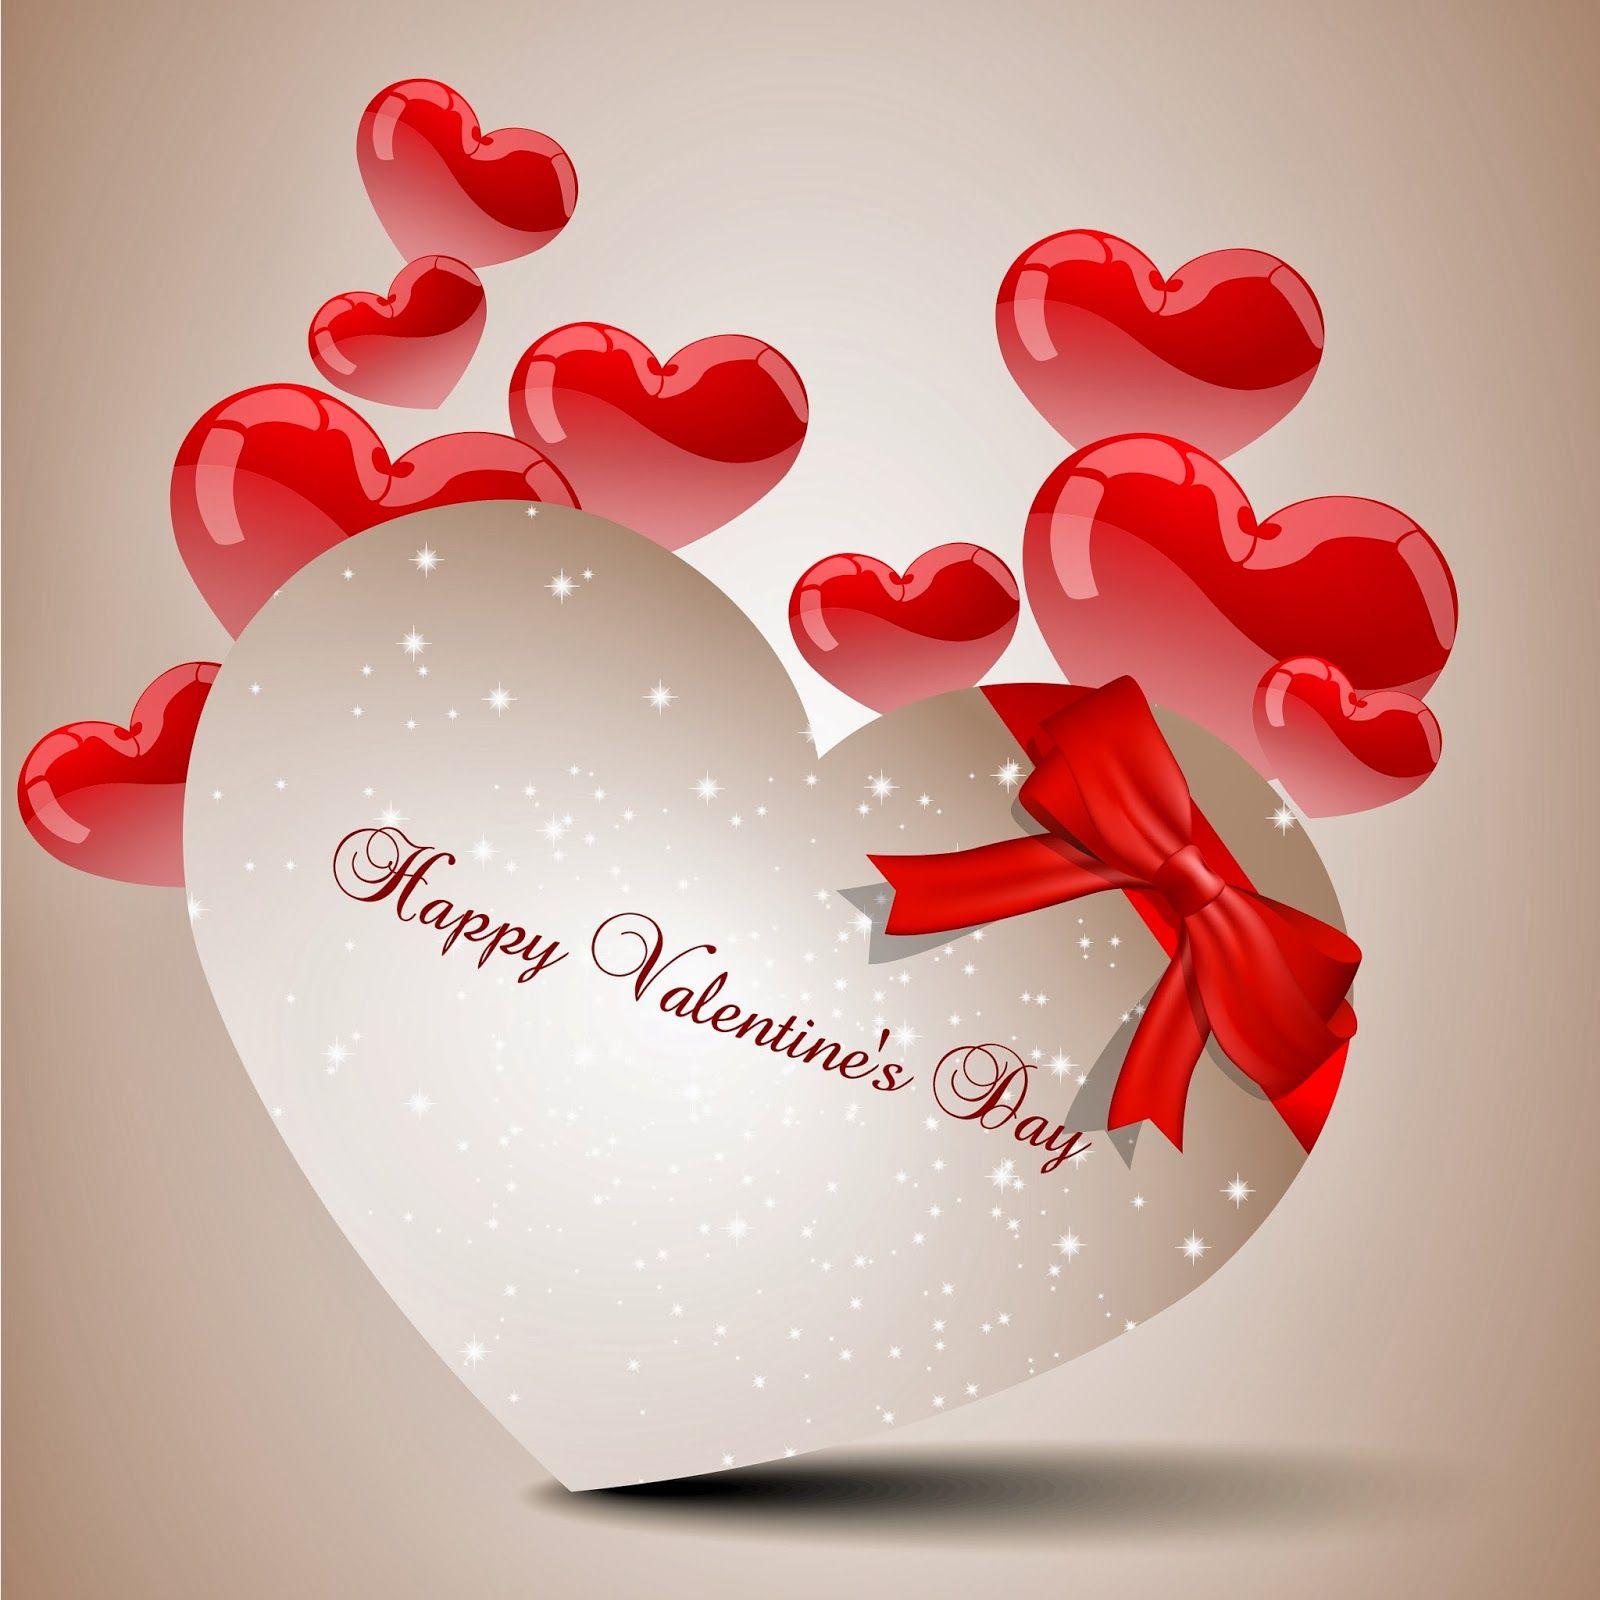 ♥✿ happy valentine's day ✿♥   ❤️happy valentine day